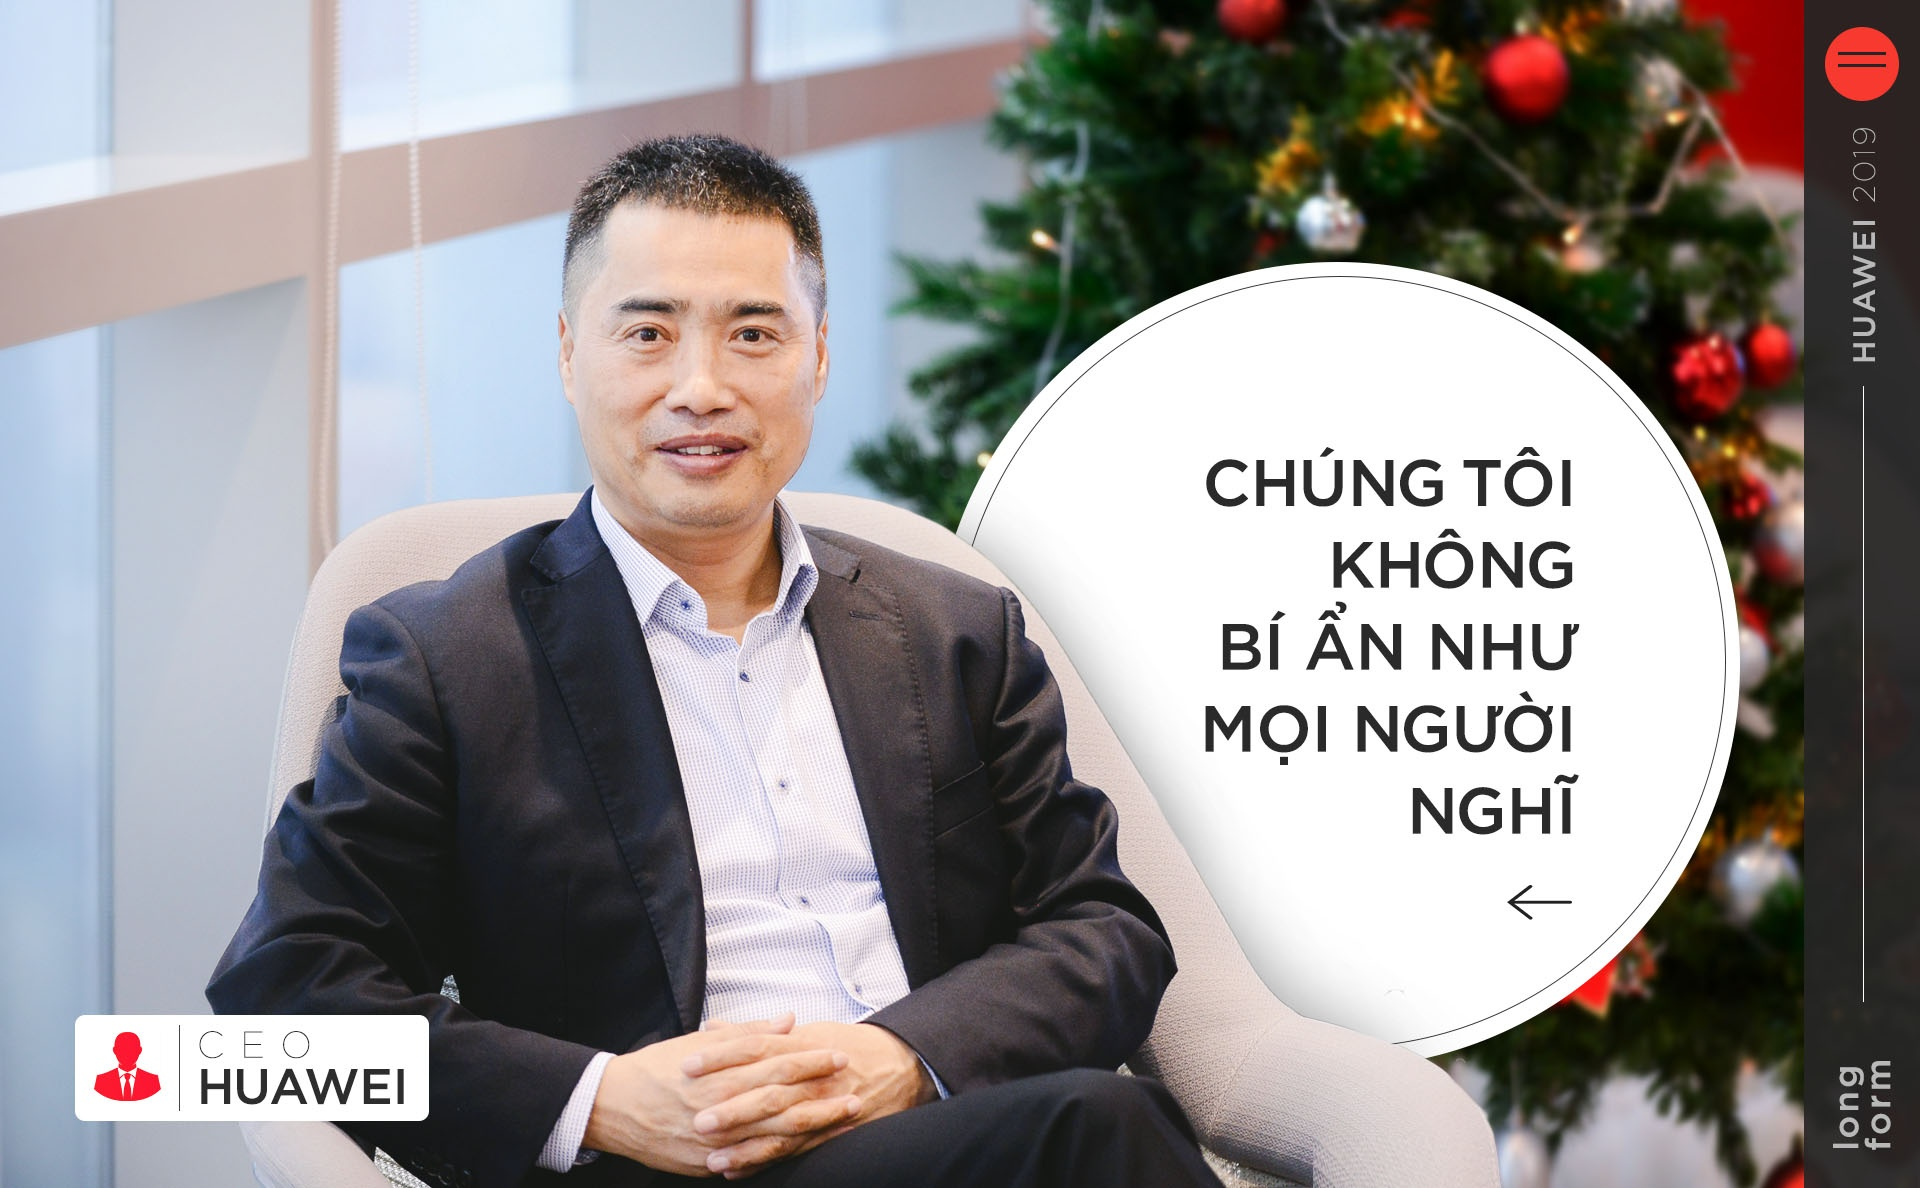 CEO Huawei VN: 'Chung toi khong bi an nhu moi nguoi nghi' hinh anh 2